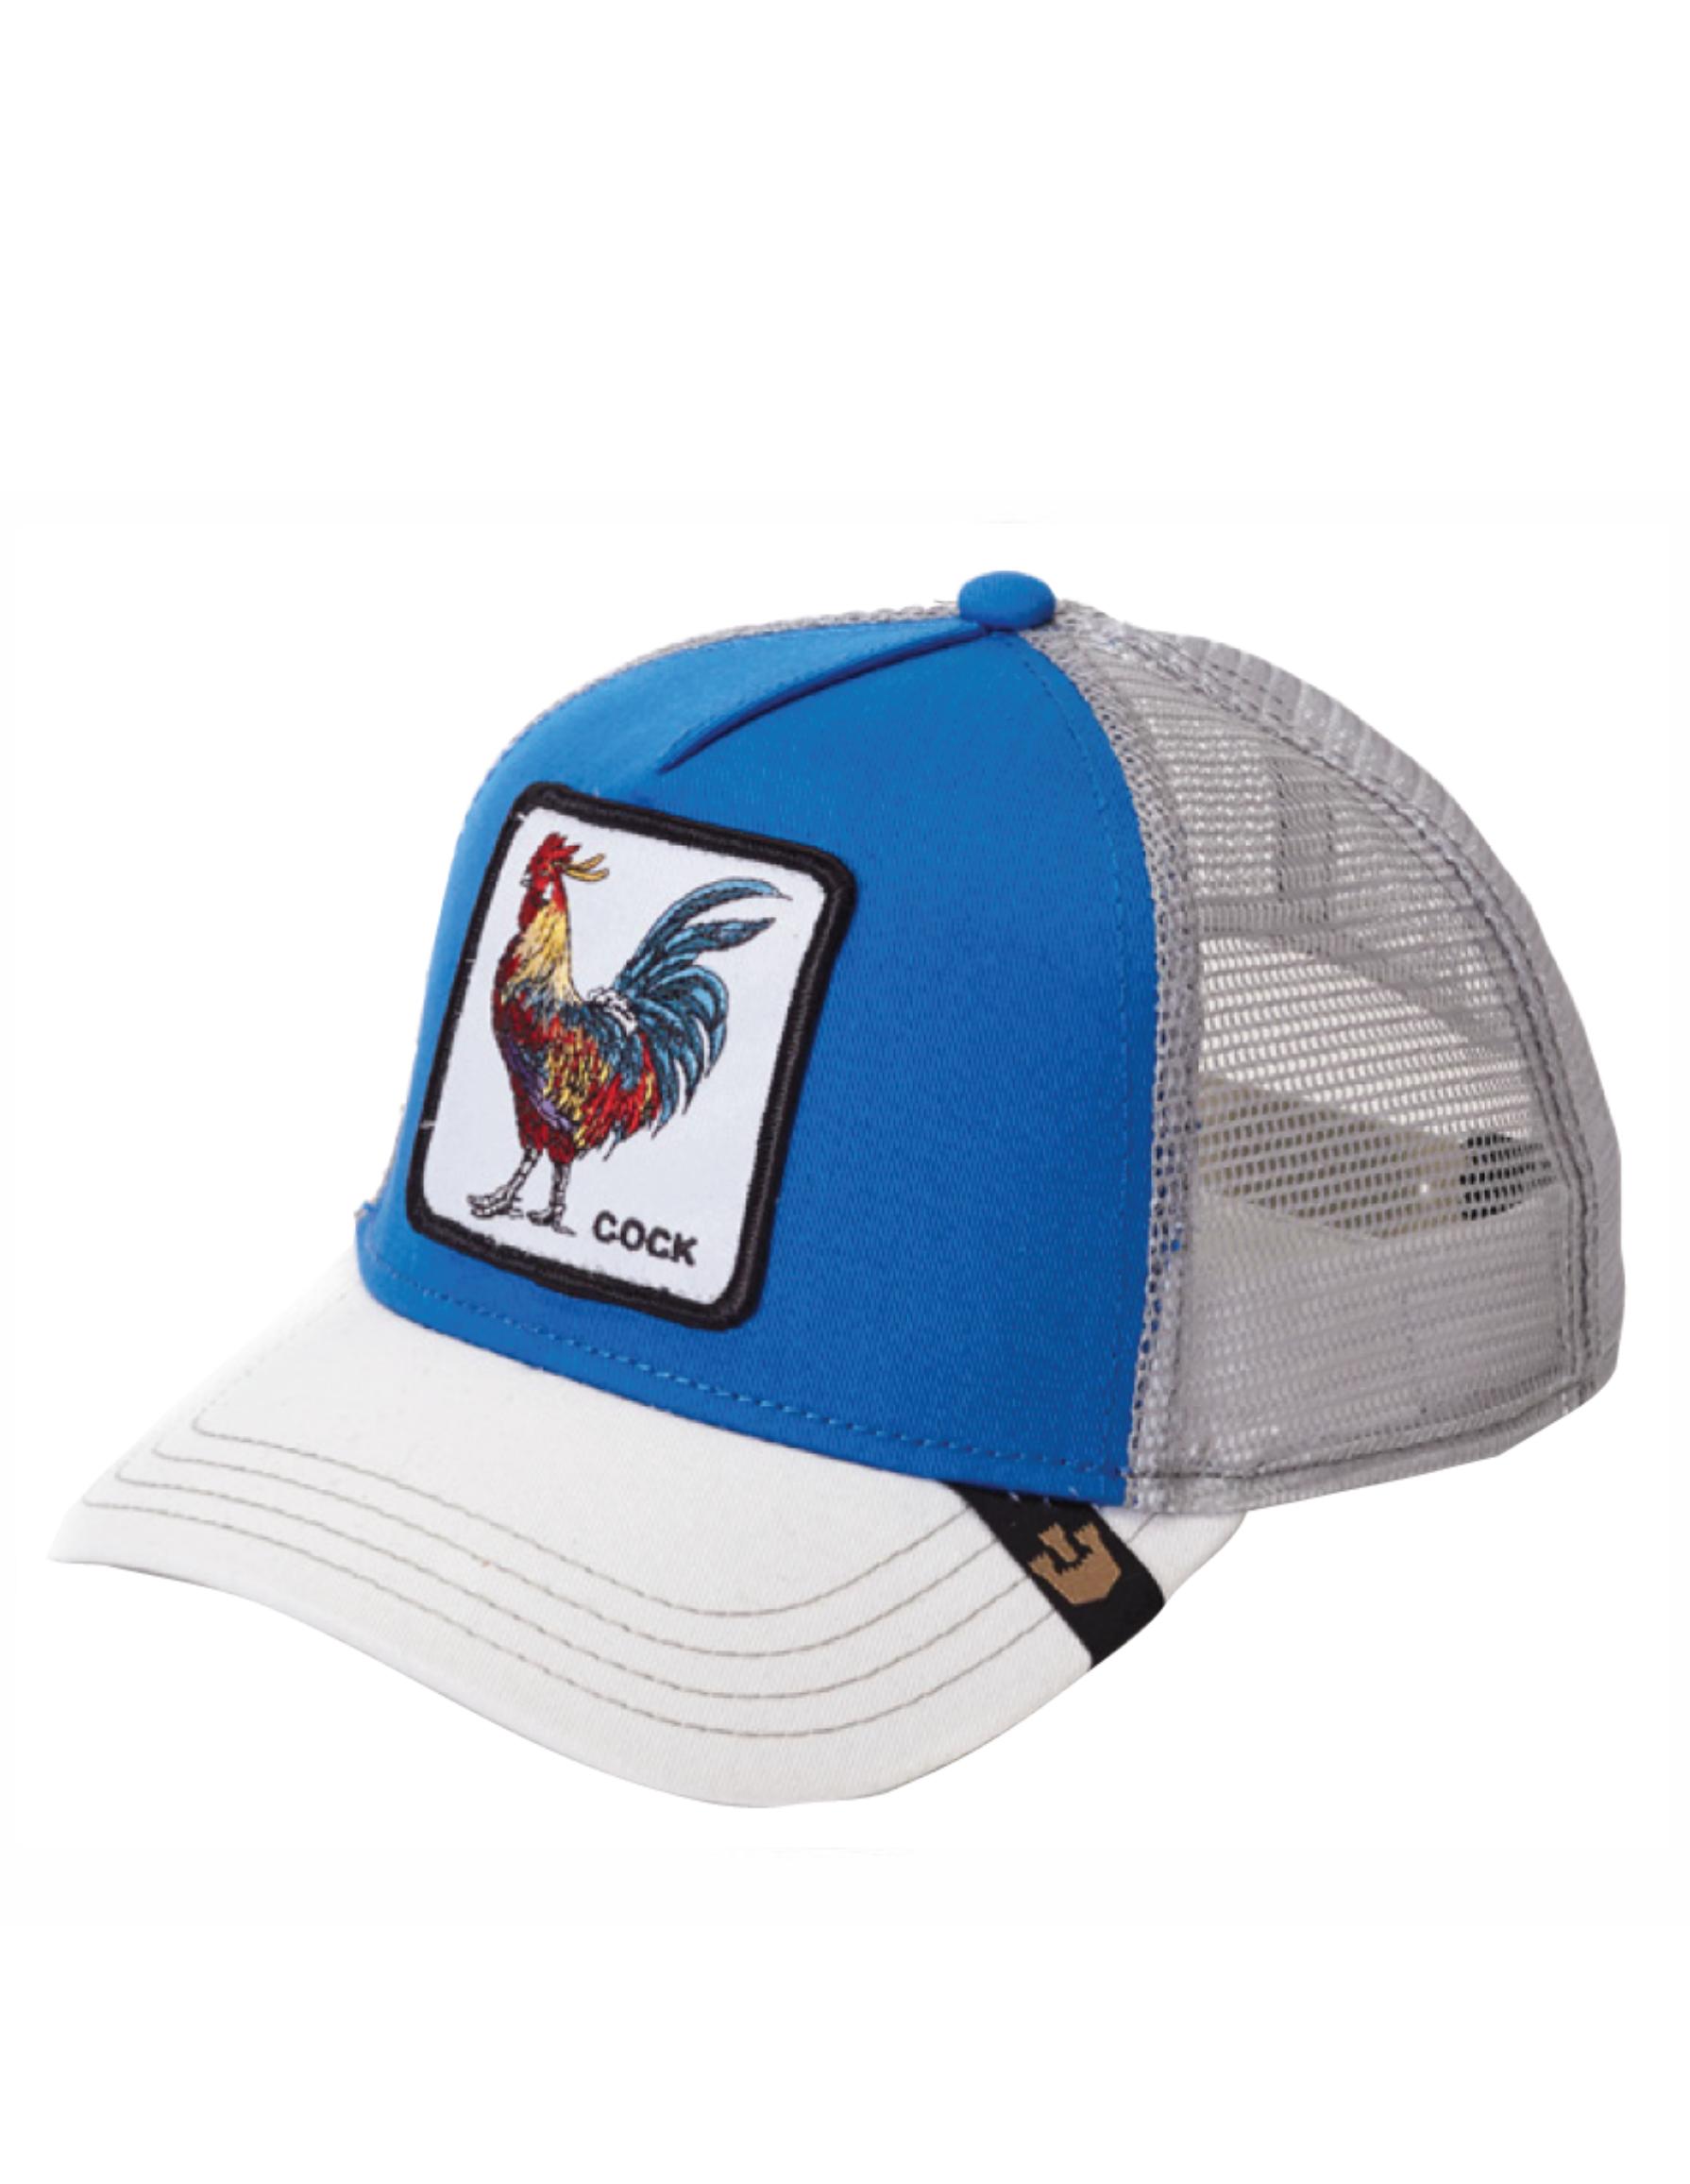 Goorin Bros. Gallo Trucker cap - Royal Blue - €34 545661f0e79c